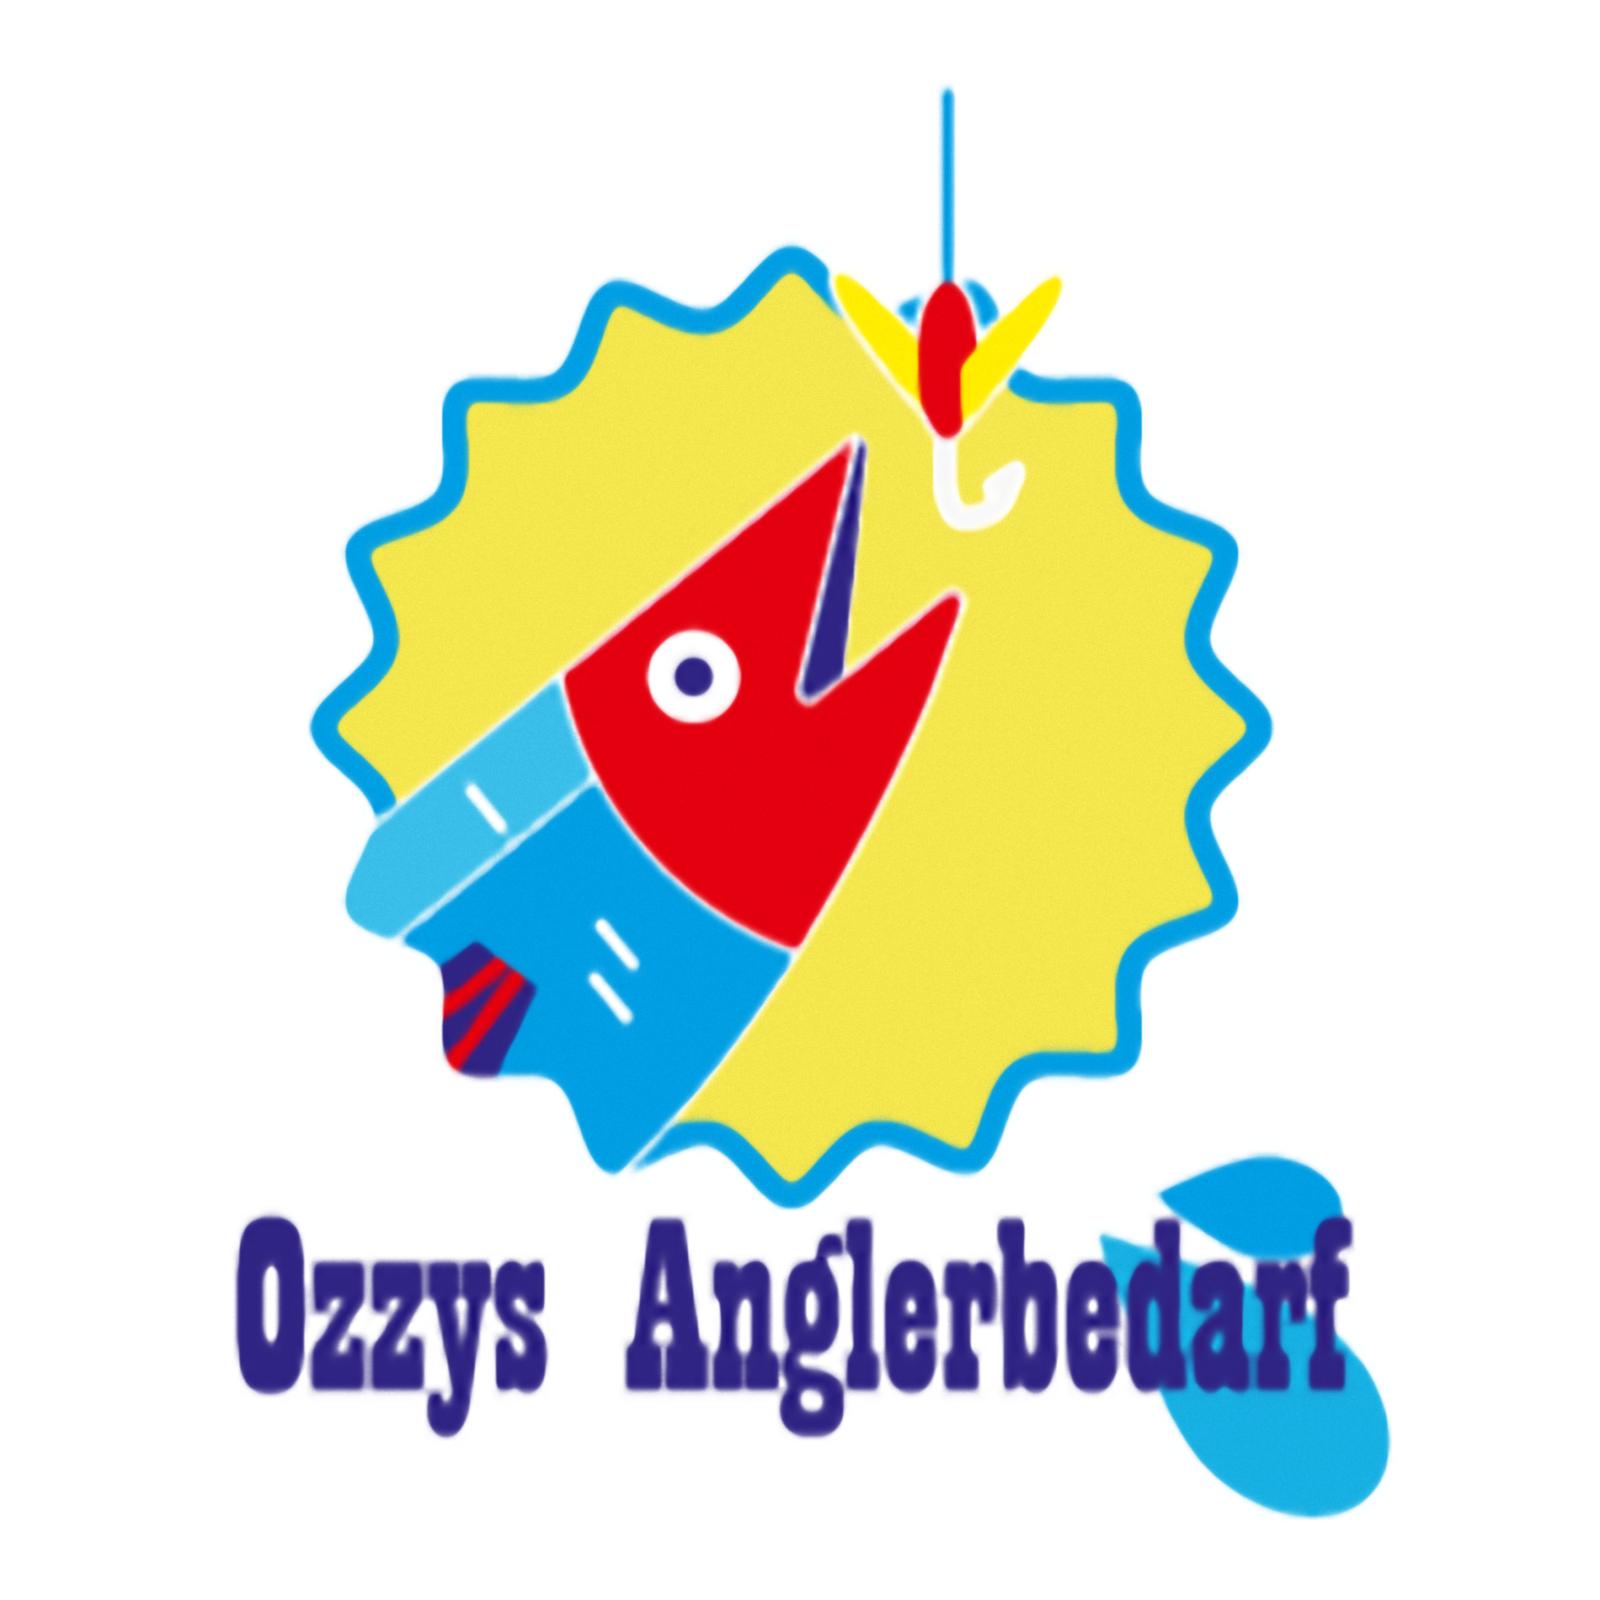 Logo Ozzys Anglerbedarf - SmillaEnlarger, default | BANNERKÖNIG